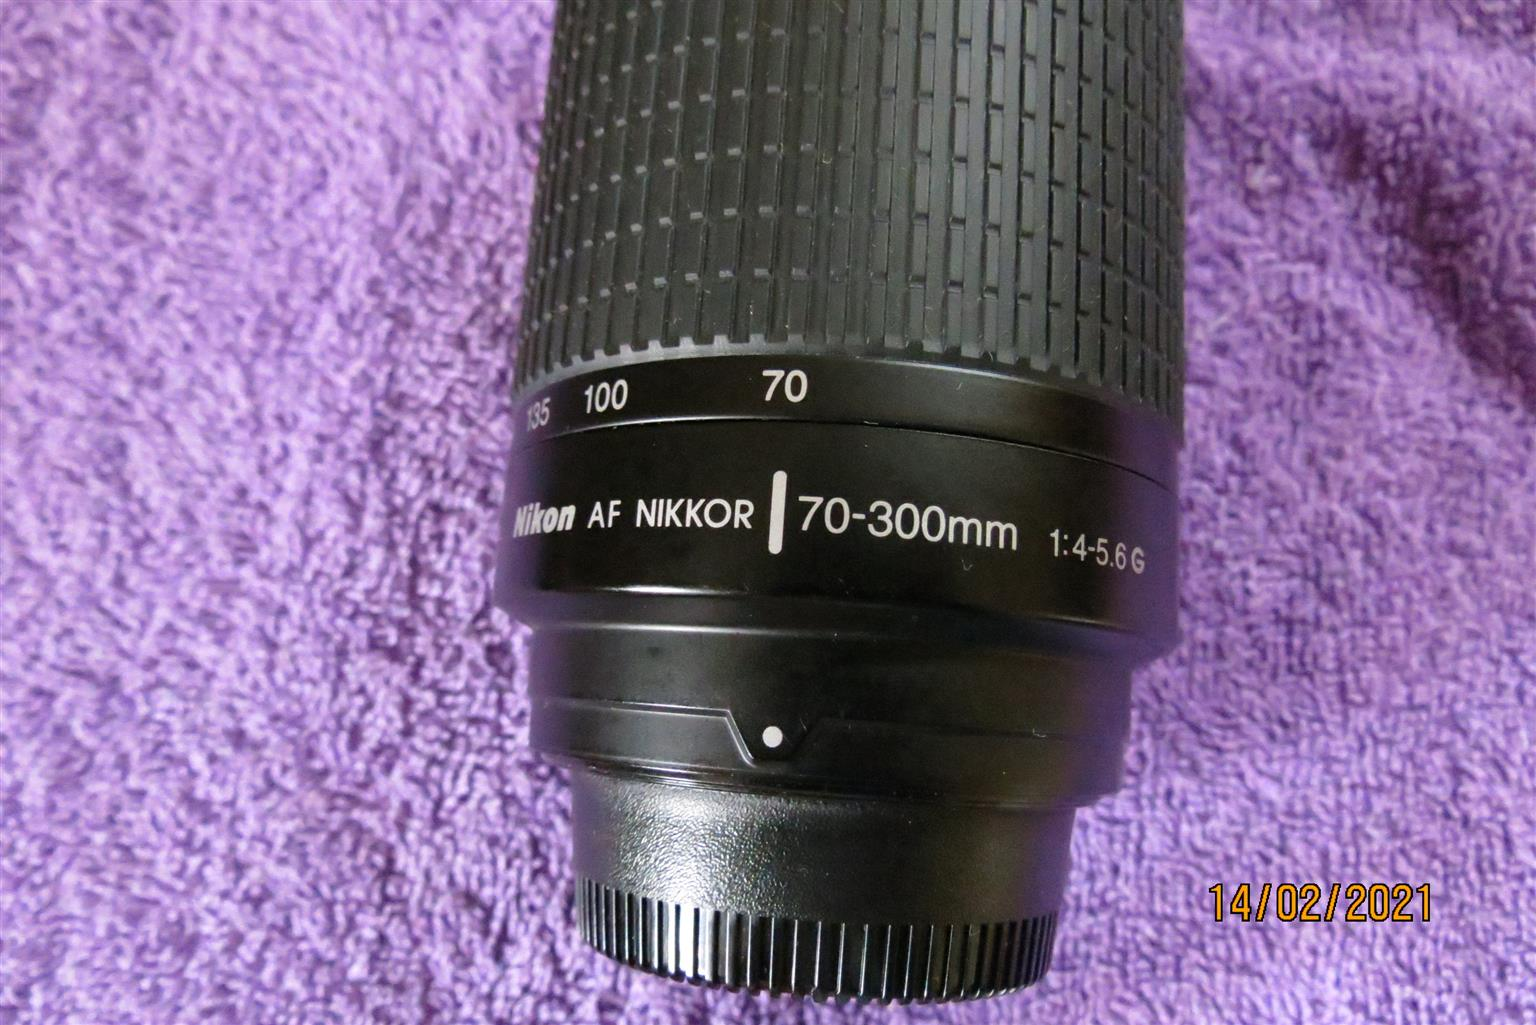 Nikon 70-300 zoom lens